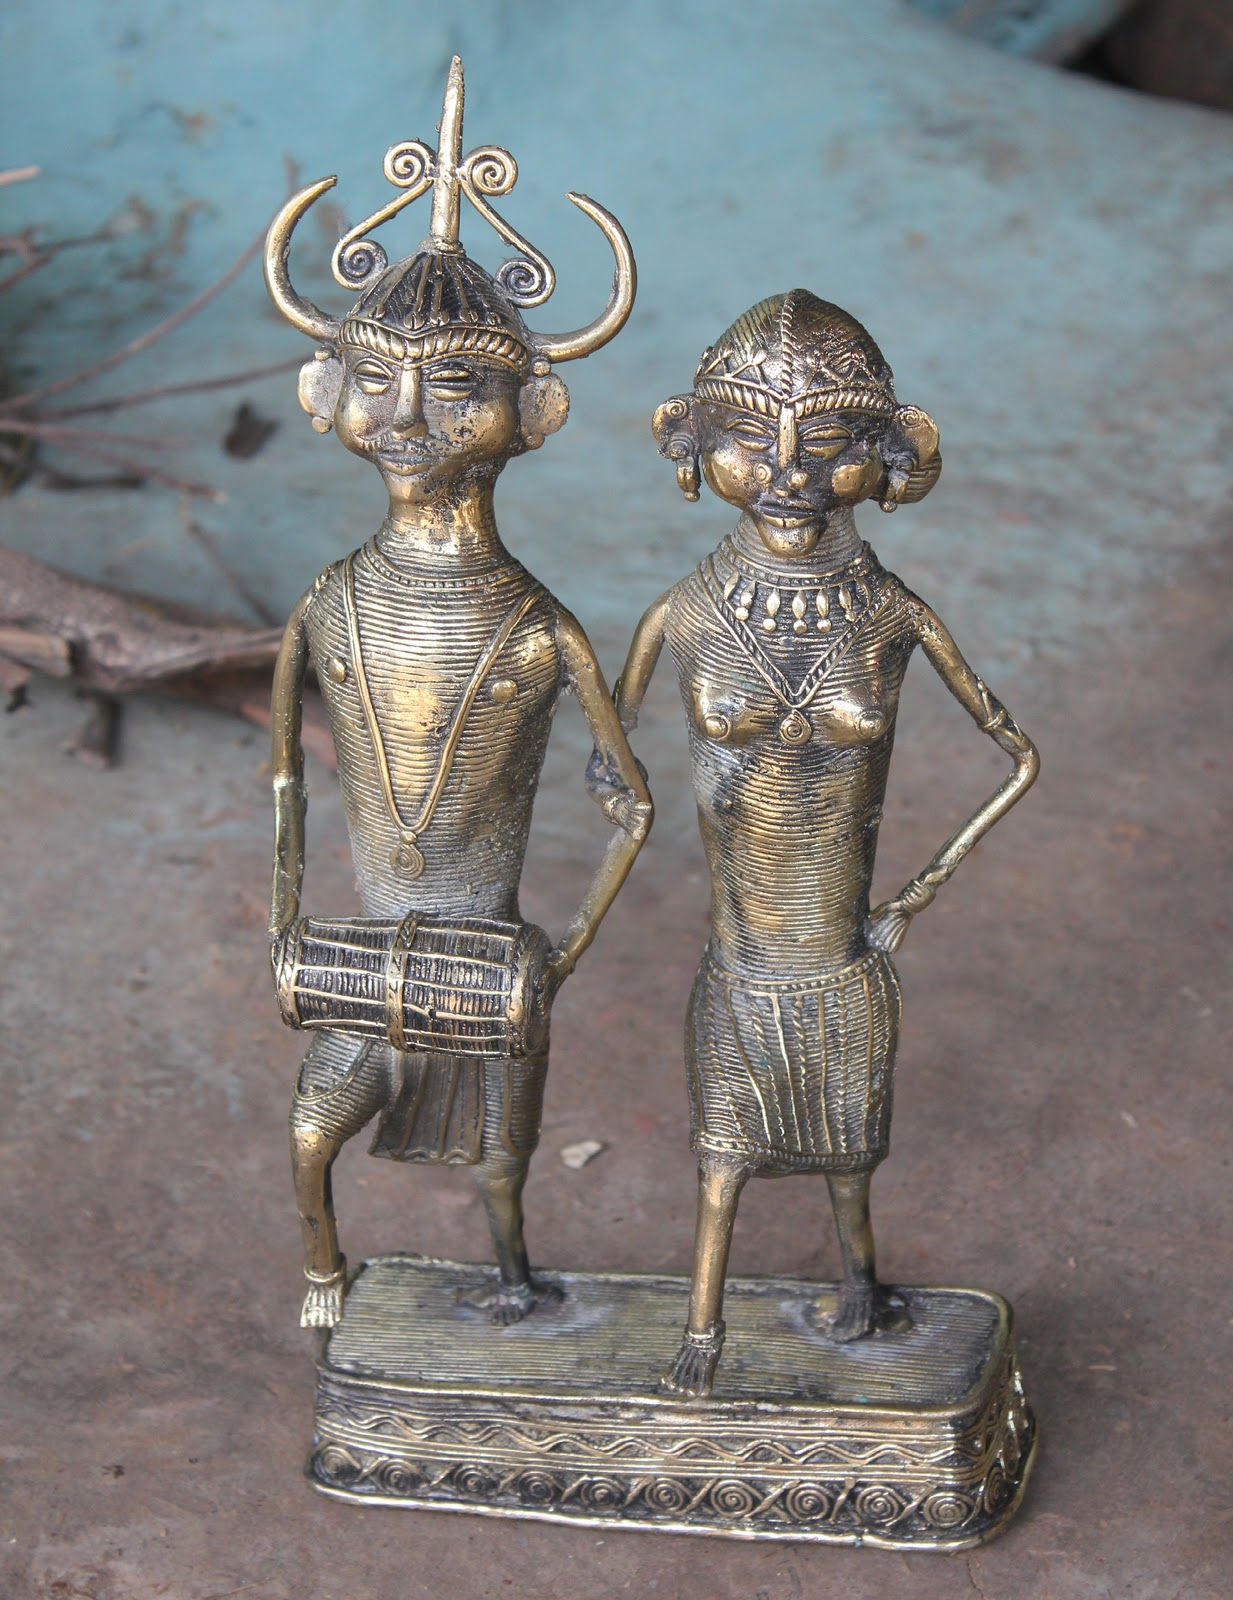 Arth Crafts: Dhokra Craft (Bell Metal)